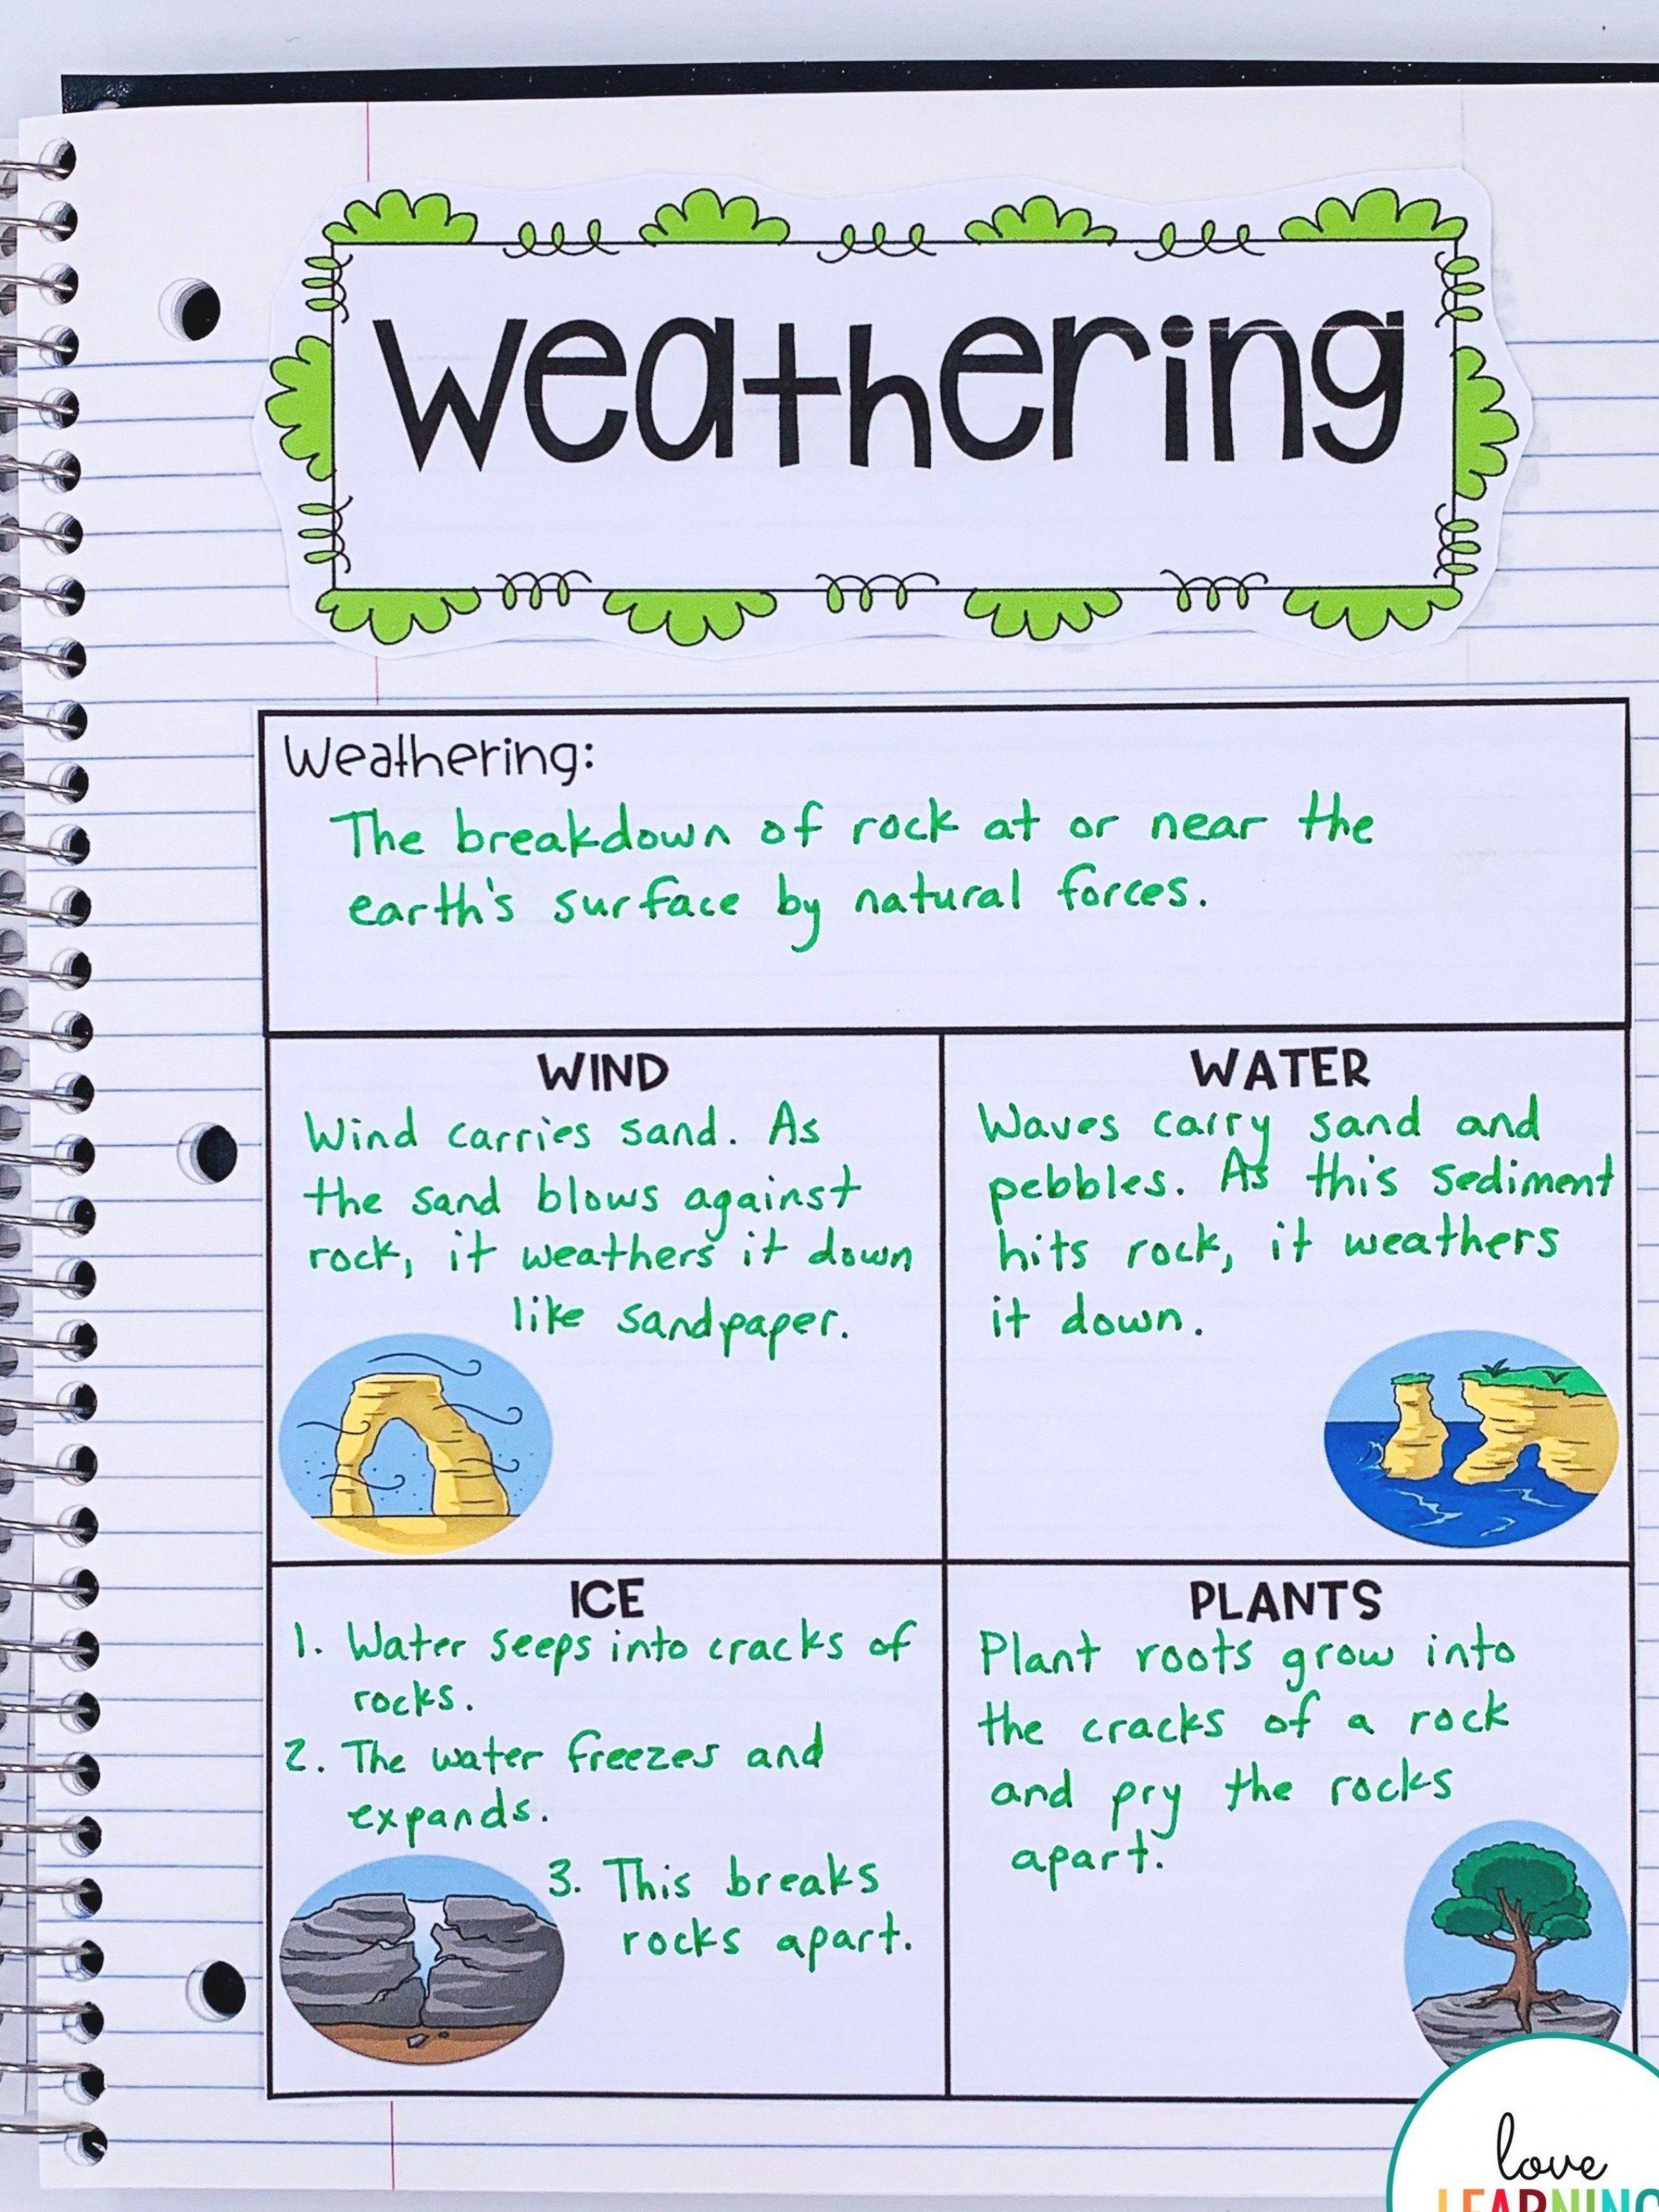 medium resolution of Weathering Park Erosion Worksheet   Printable Worksheets and Activities for  Teachers